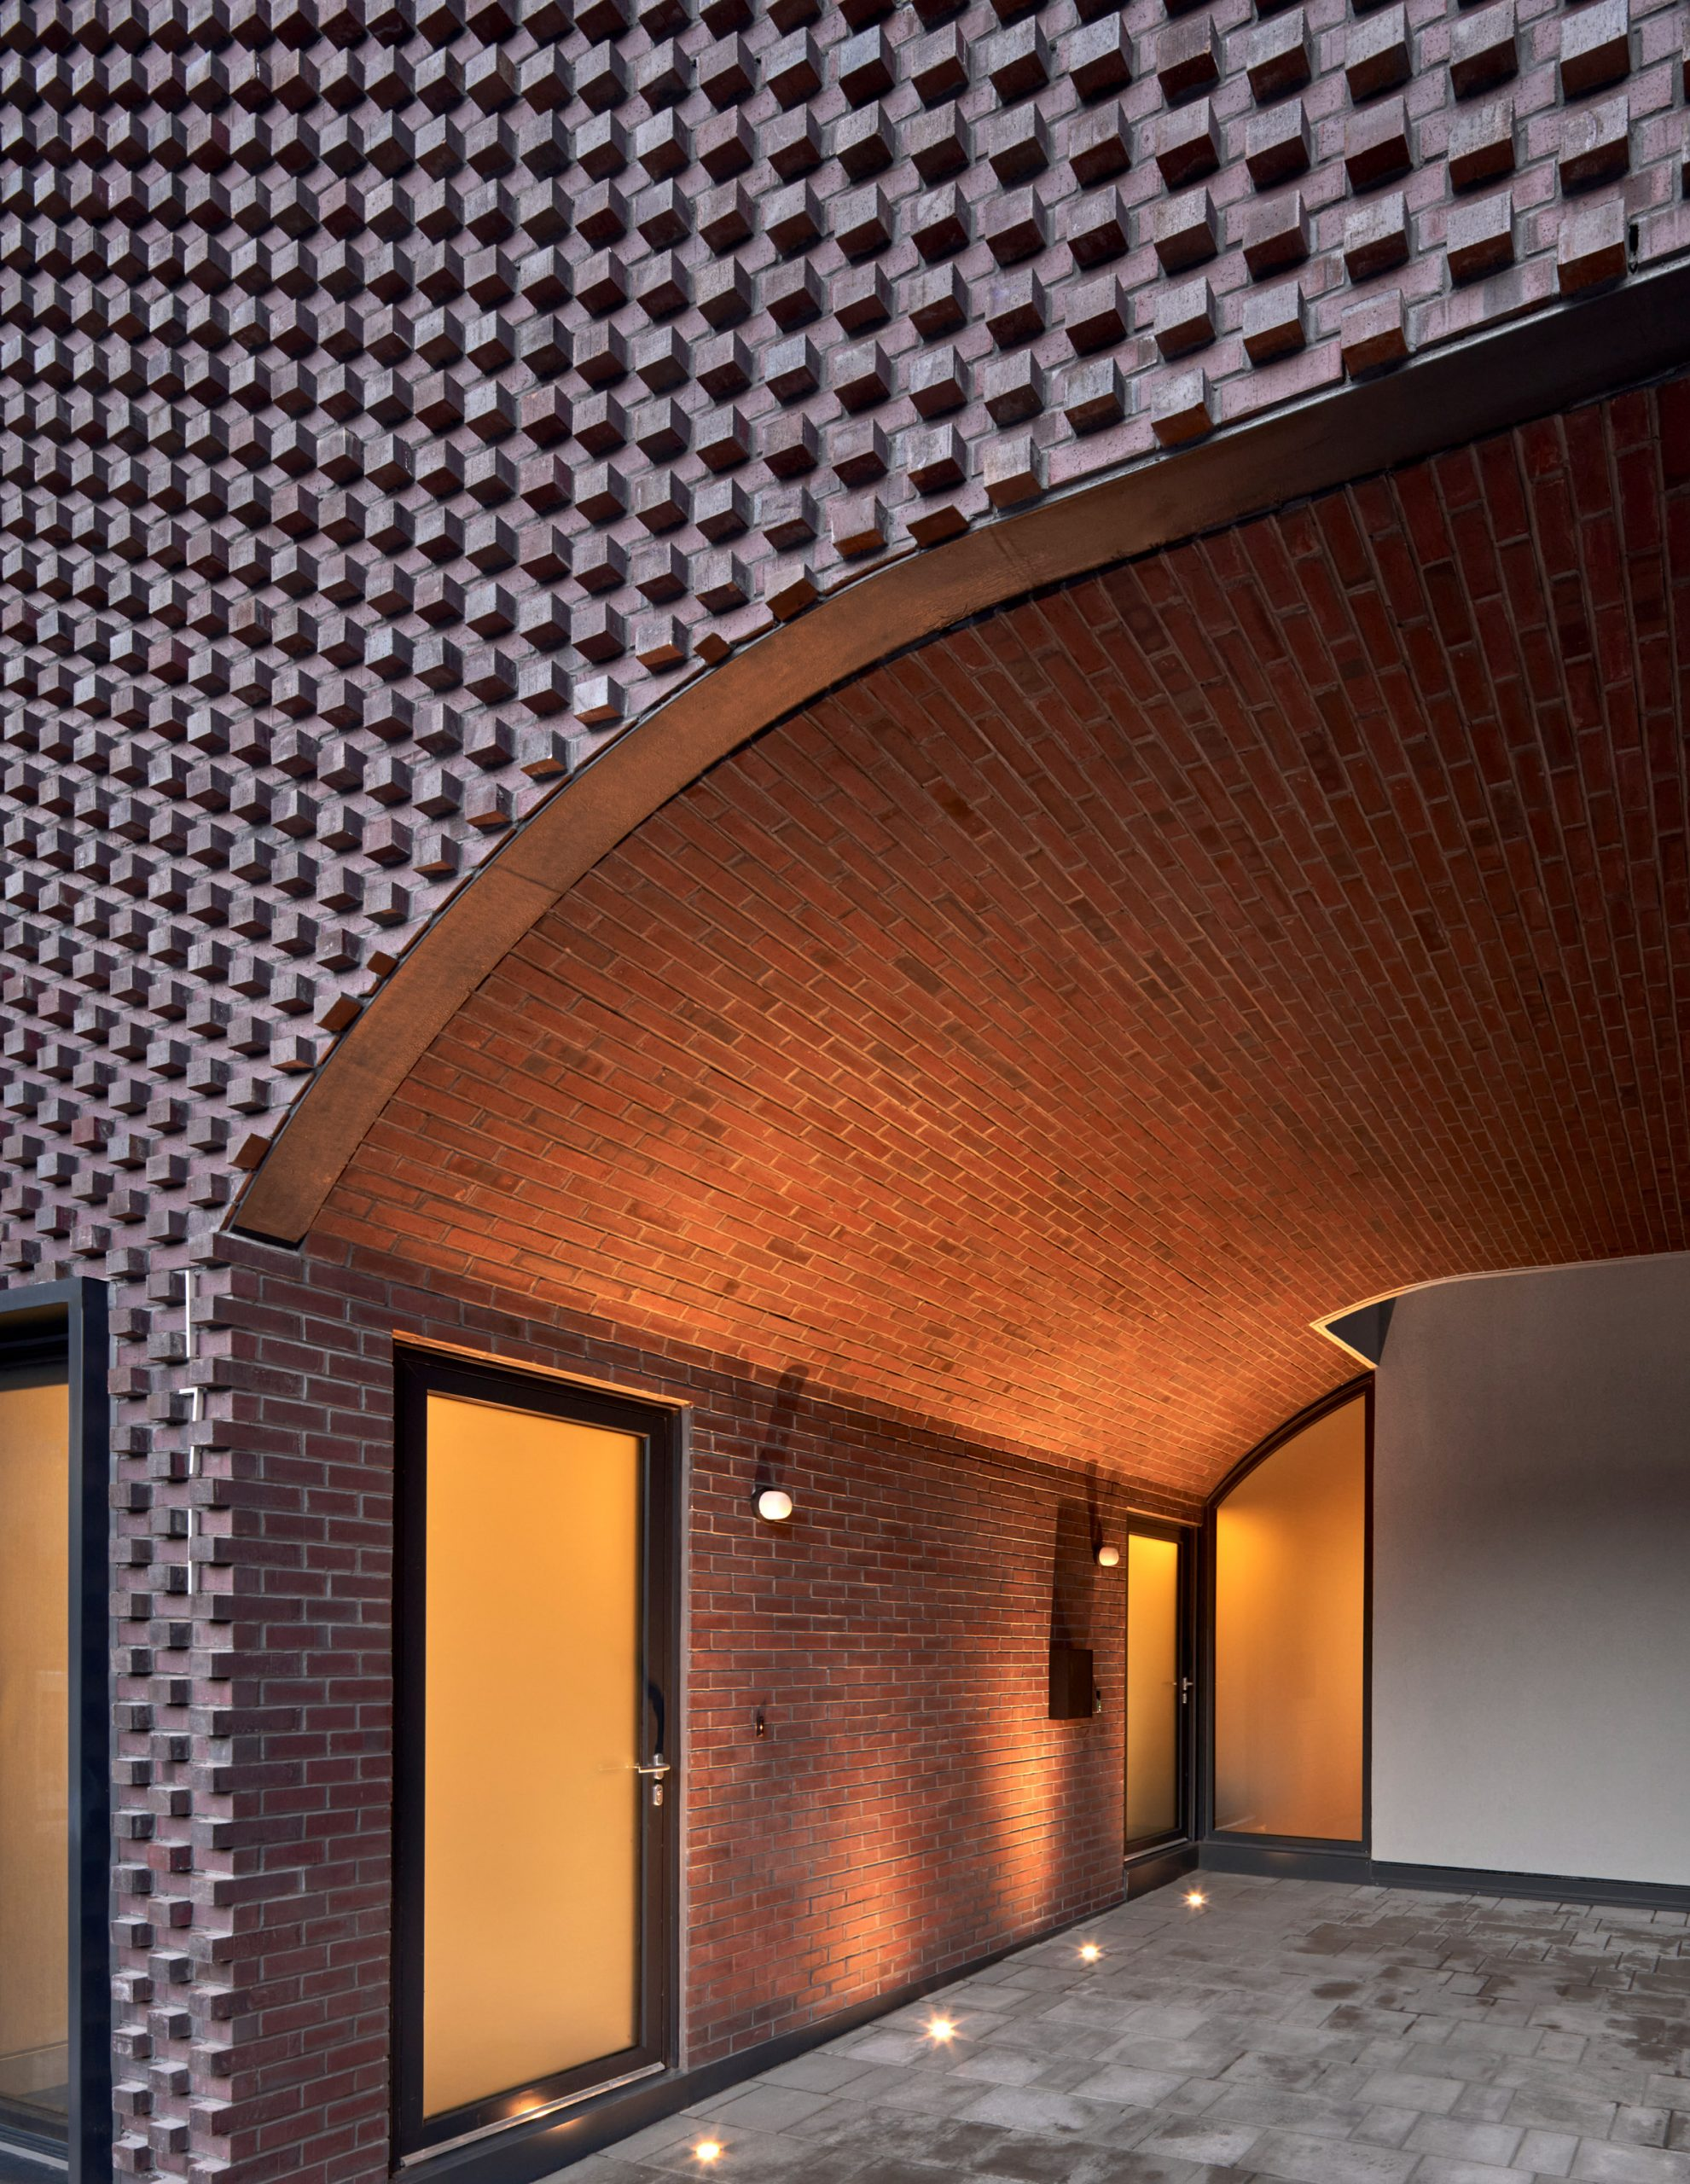 Batay-Csorba Architects played on traditional the Toronto brick facade